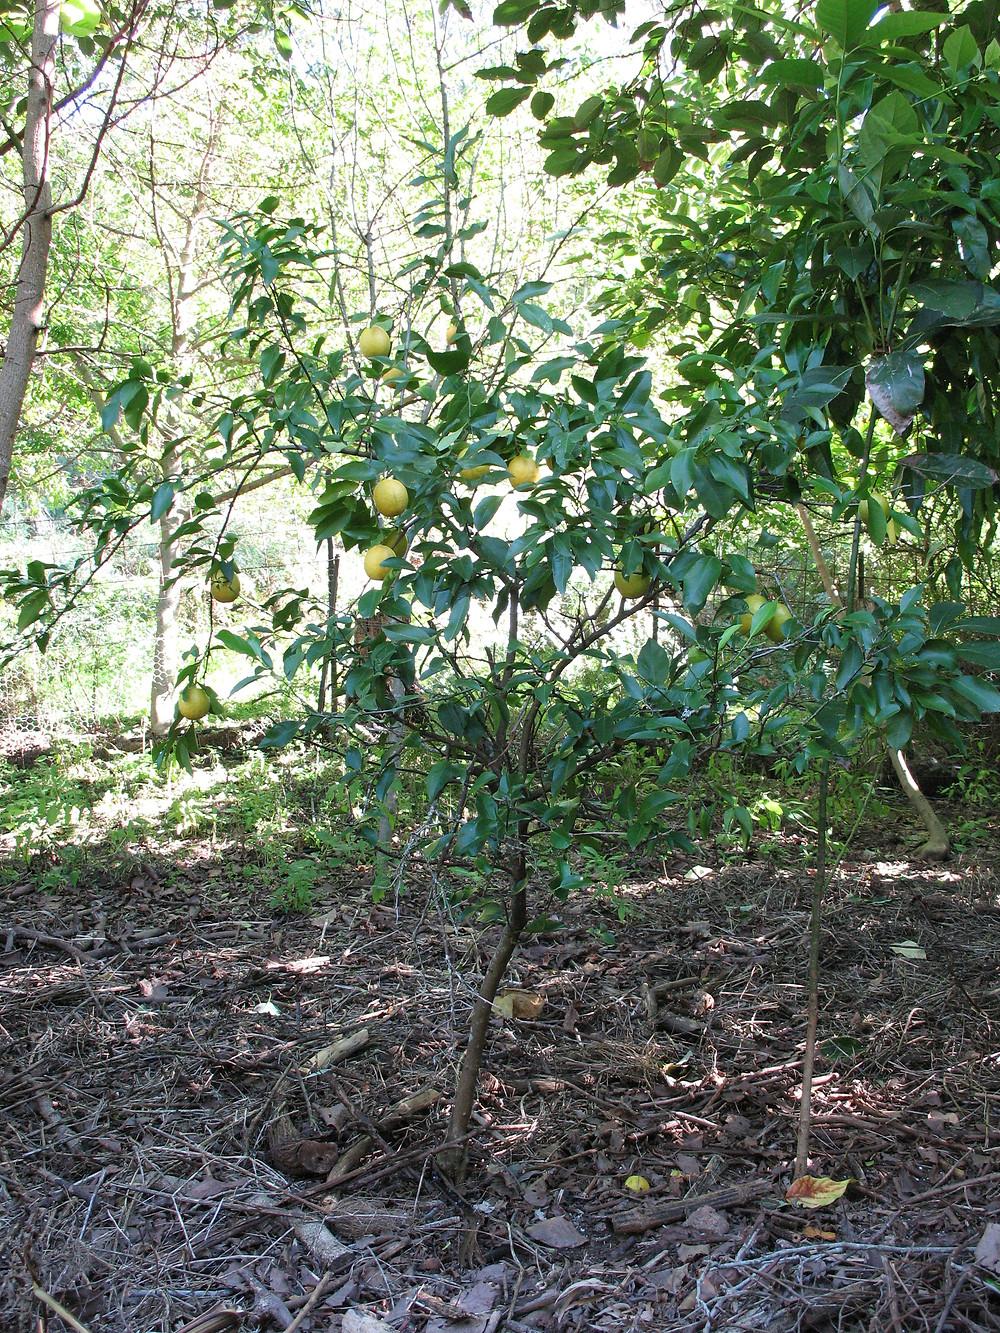 Lemonade fruit